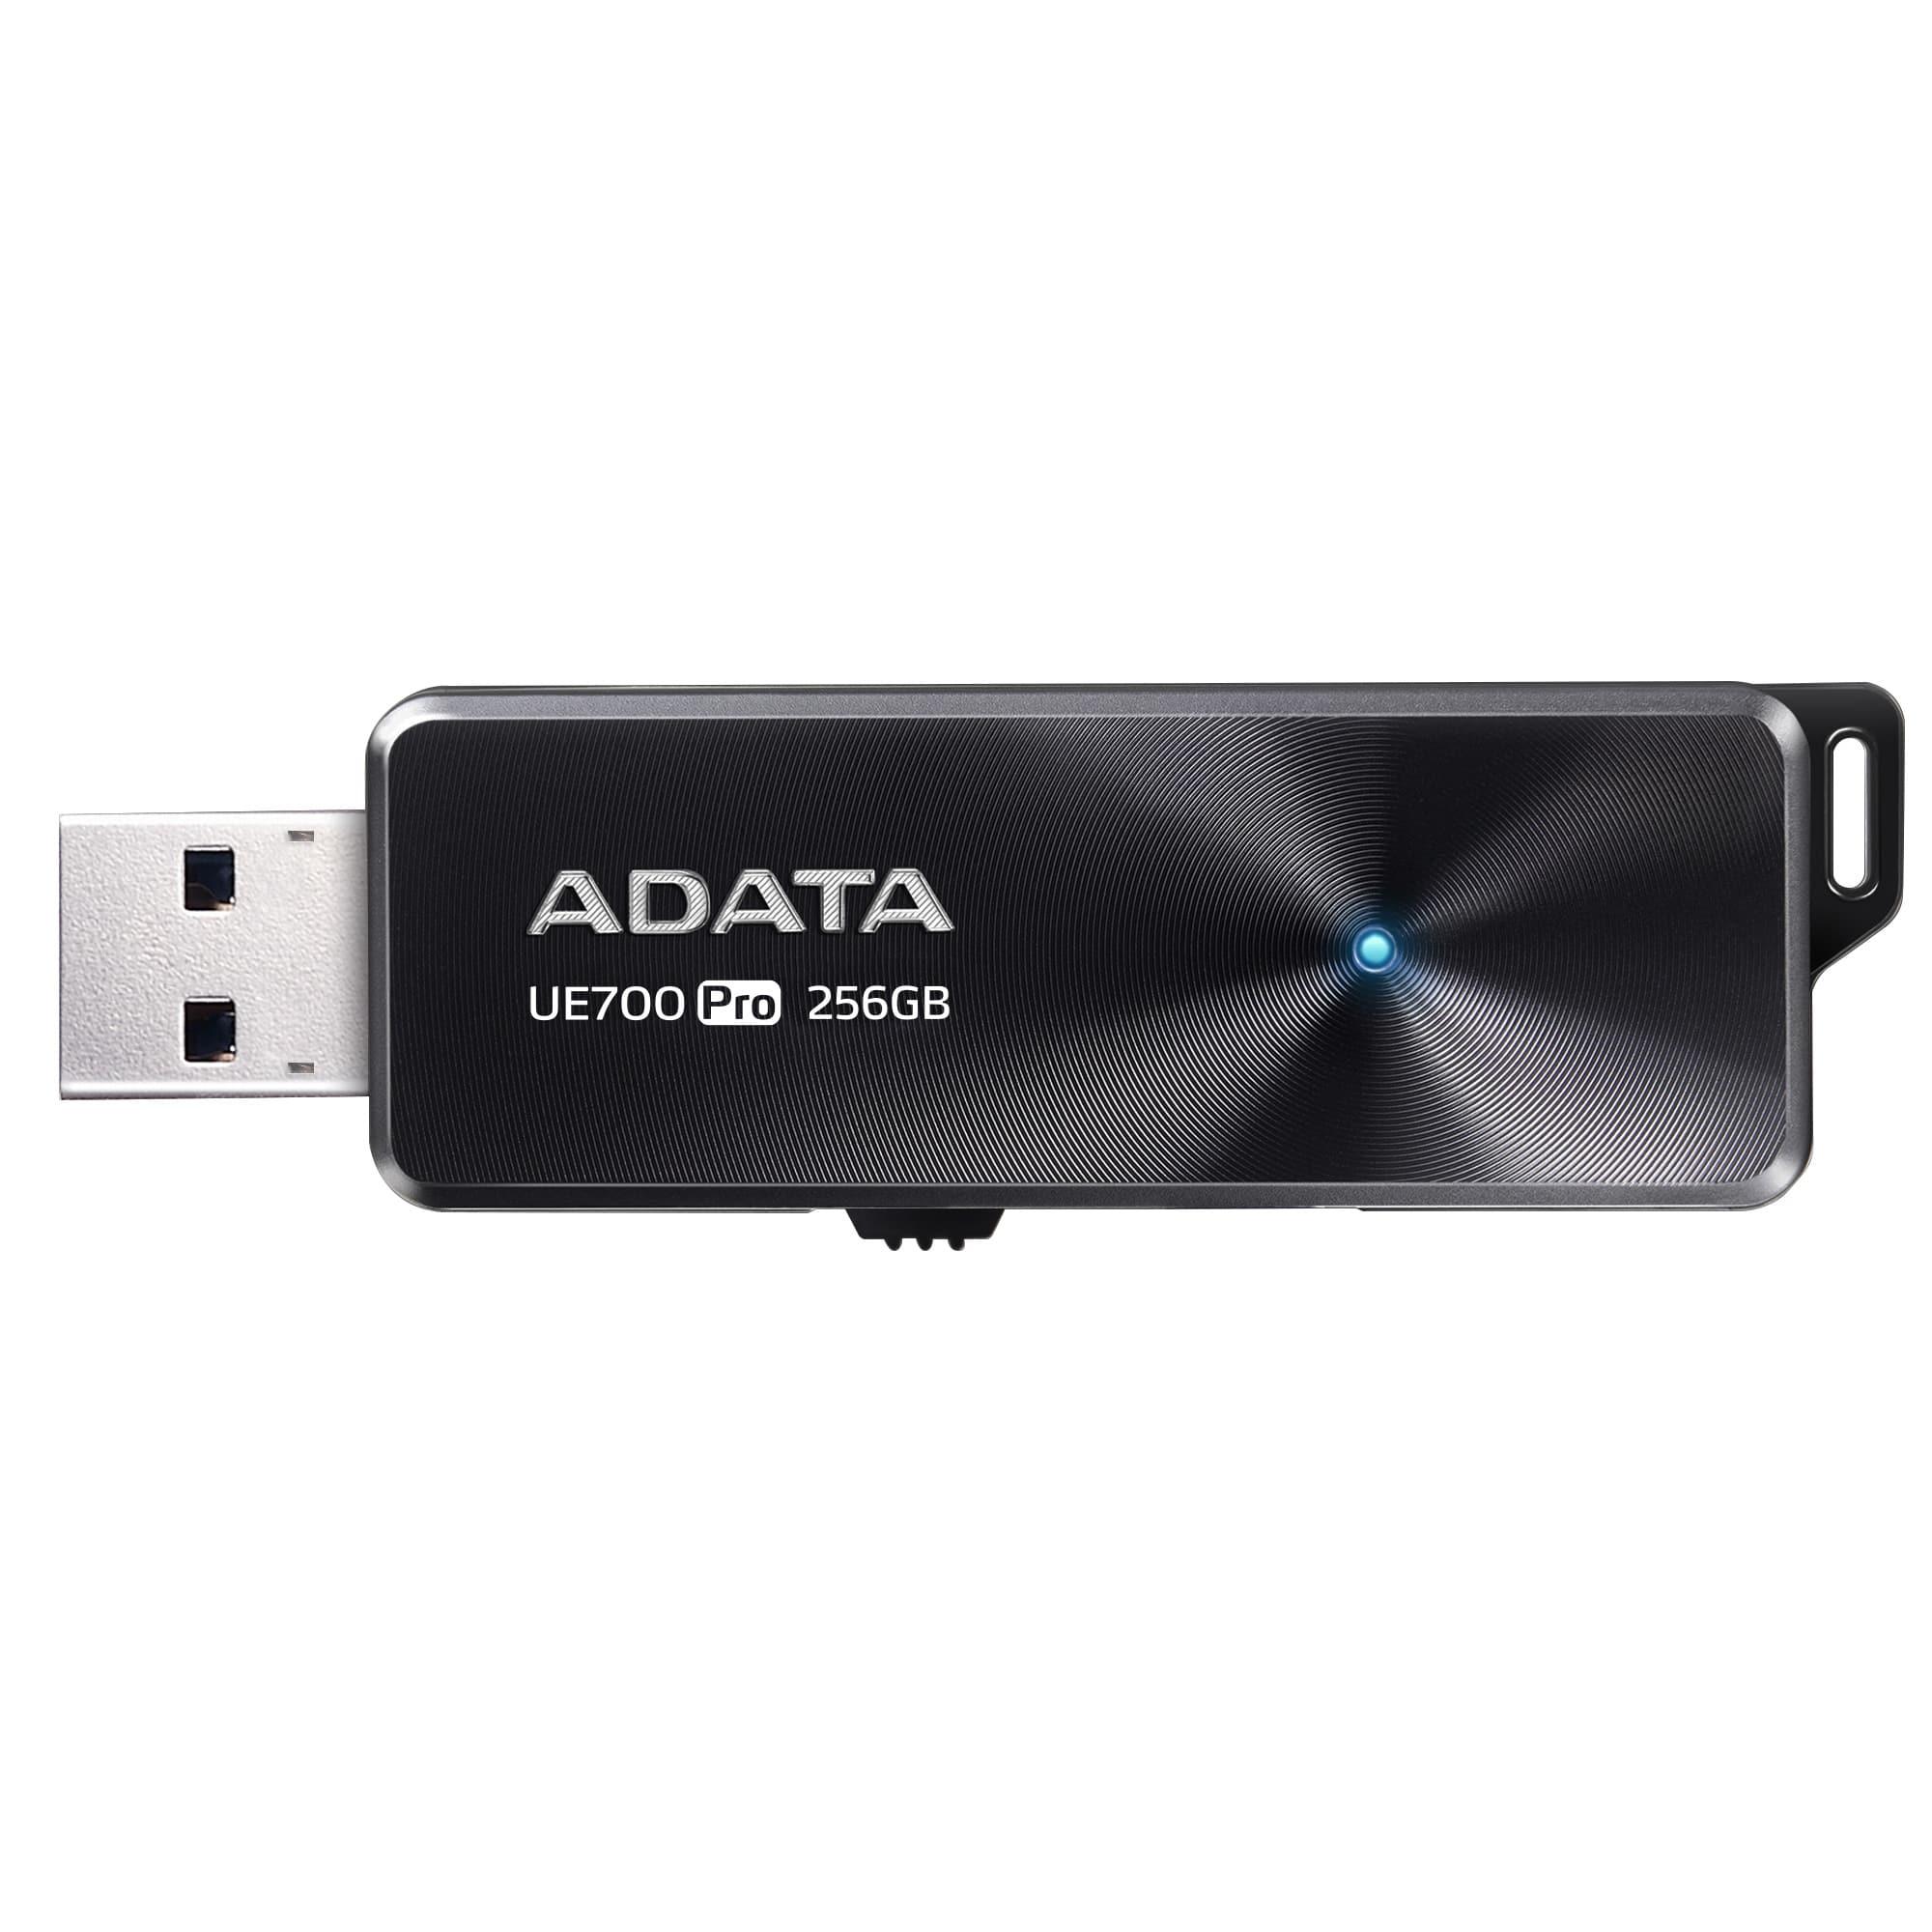 256GB ADATA USB 3.1 UE700 PRO (až 360/180MB/s) - AUE700PRO-256G-CBK